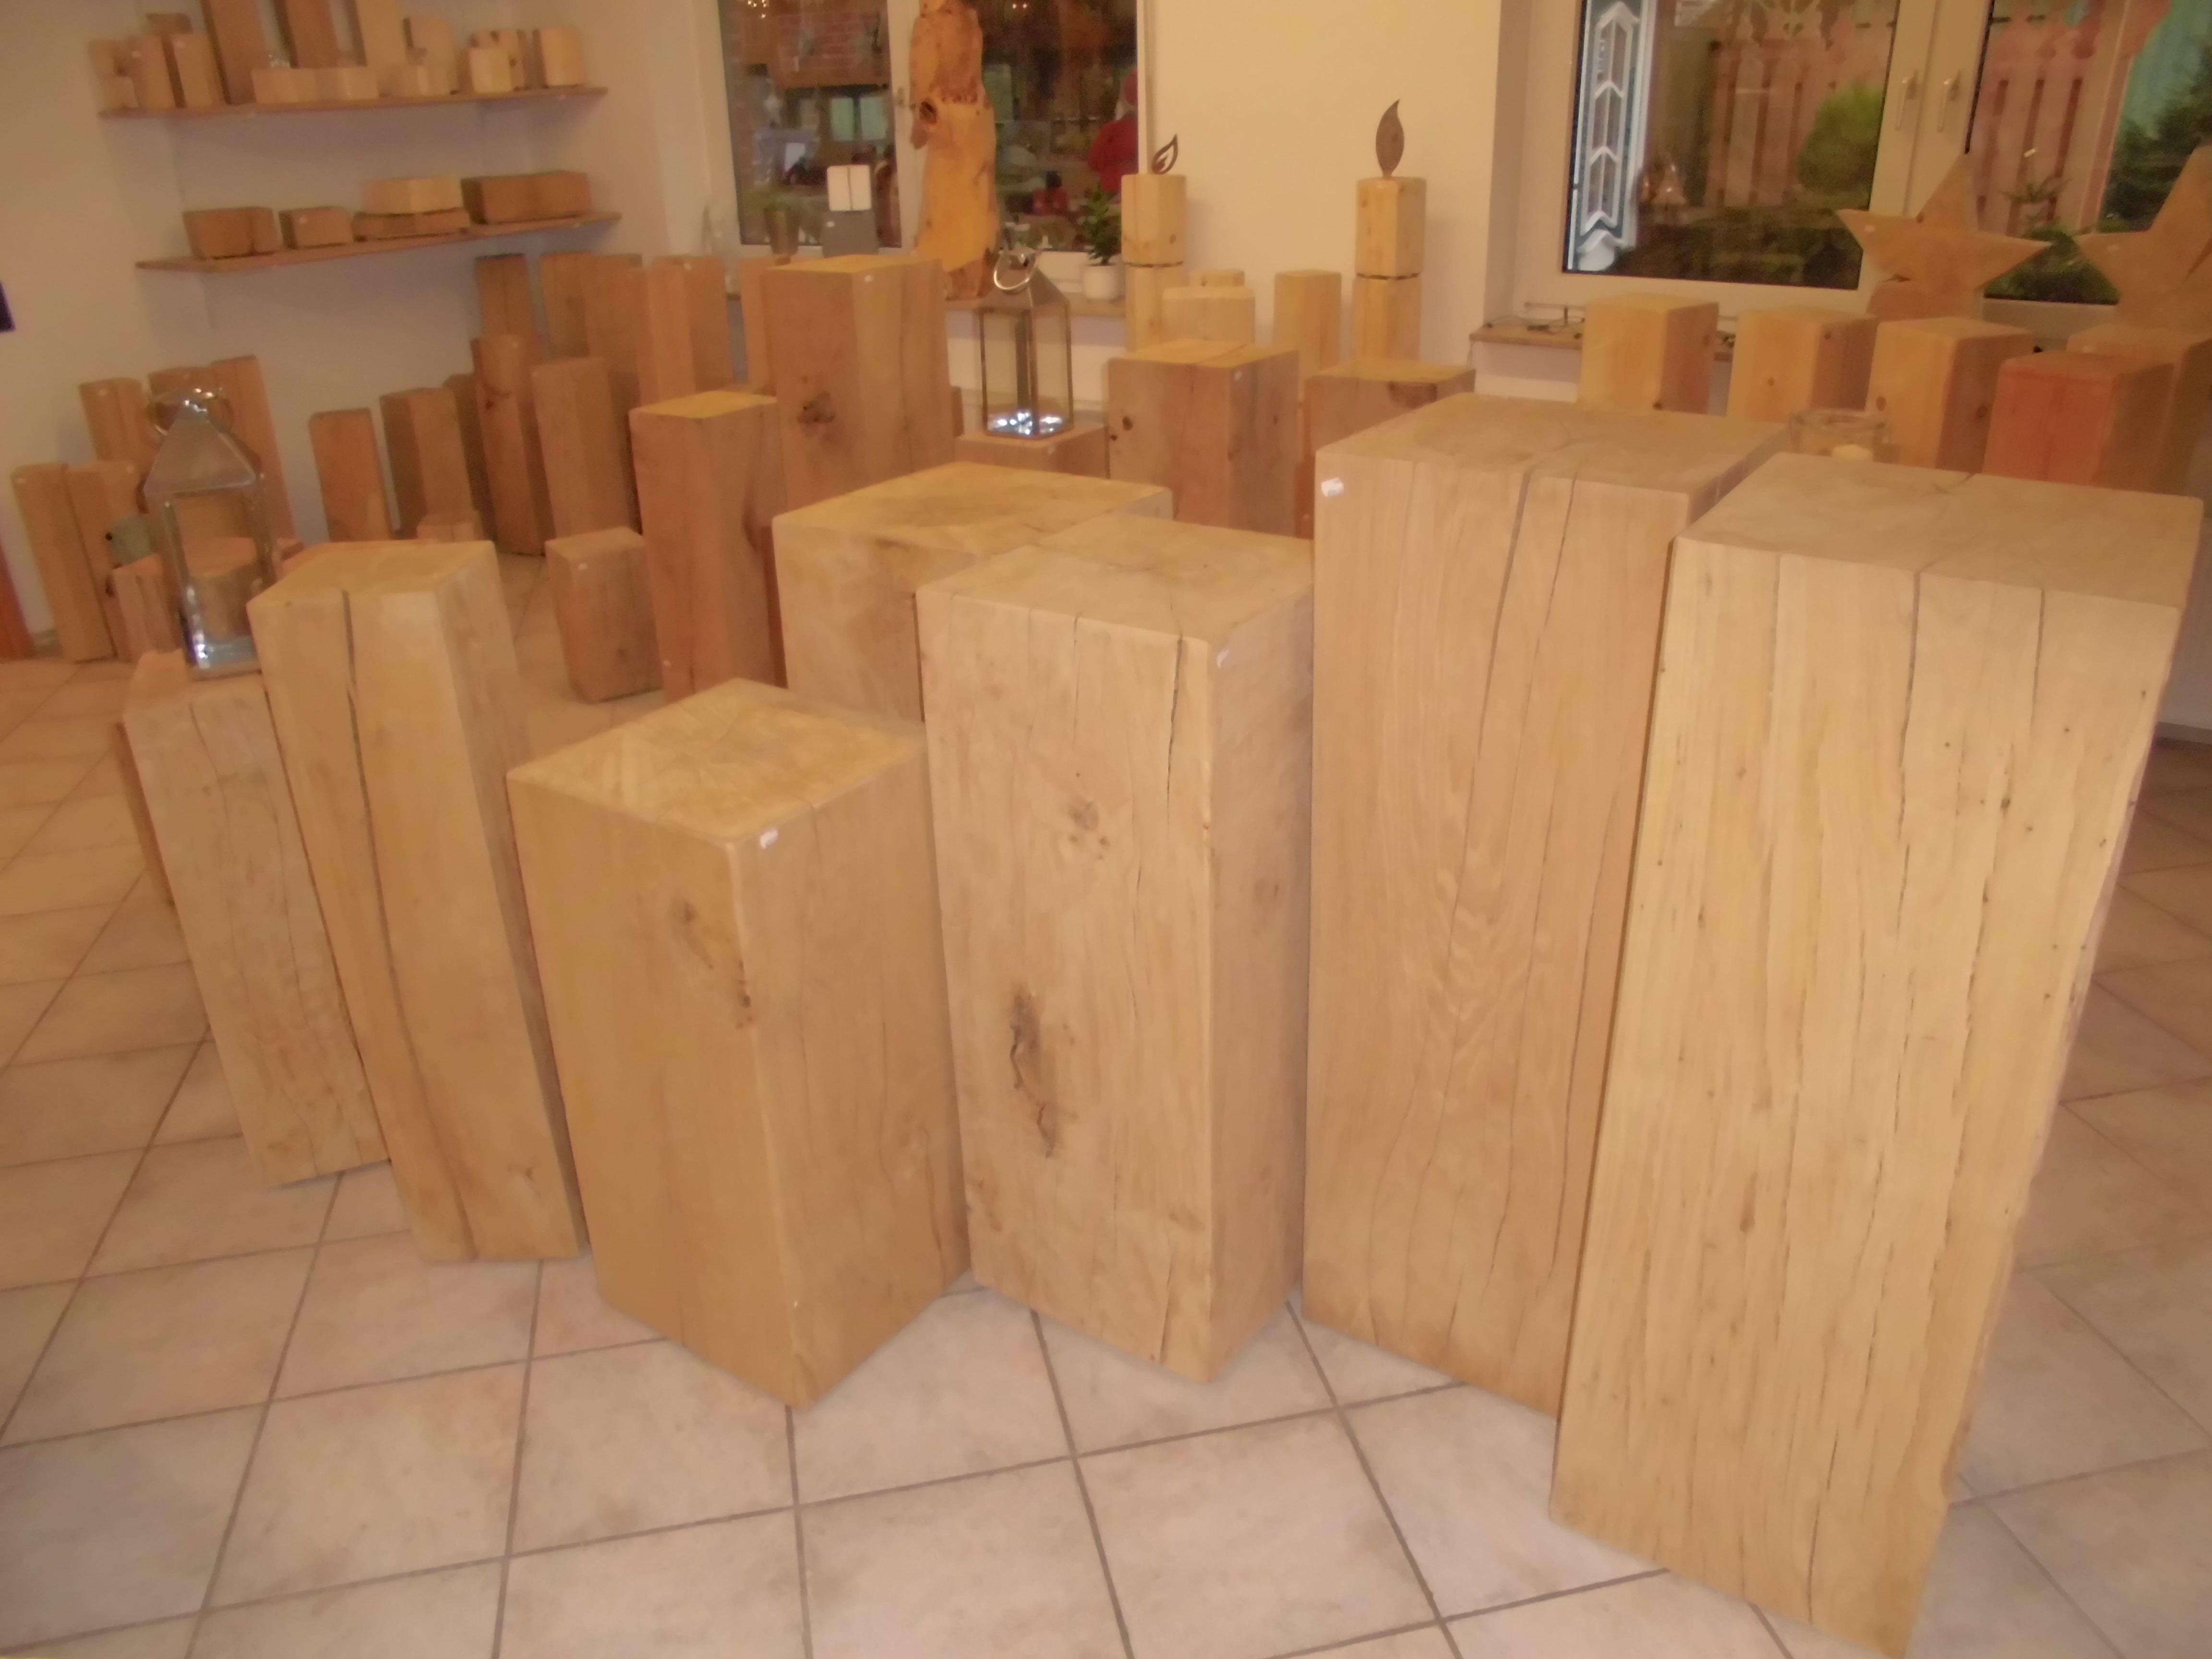 Eichenholzsäule gehobelt, geschliffen, angefast 15x15x80cm